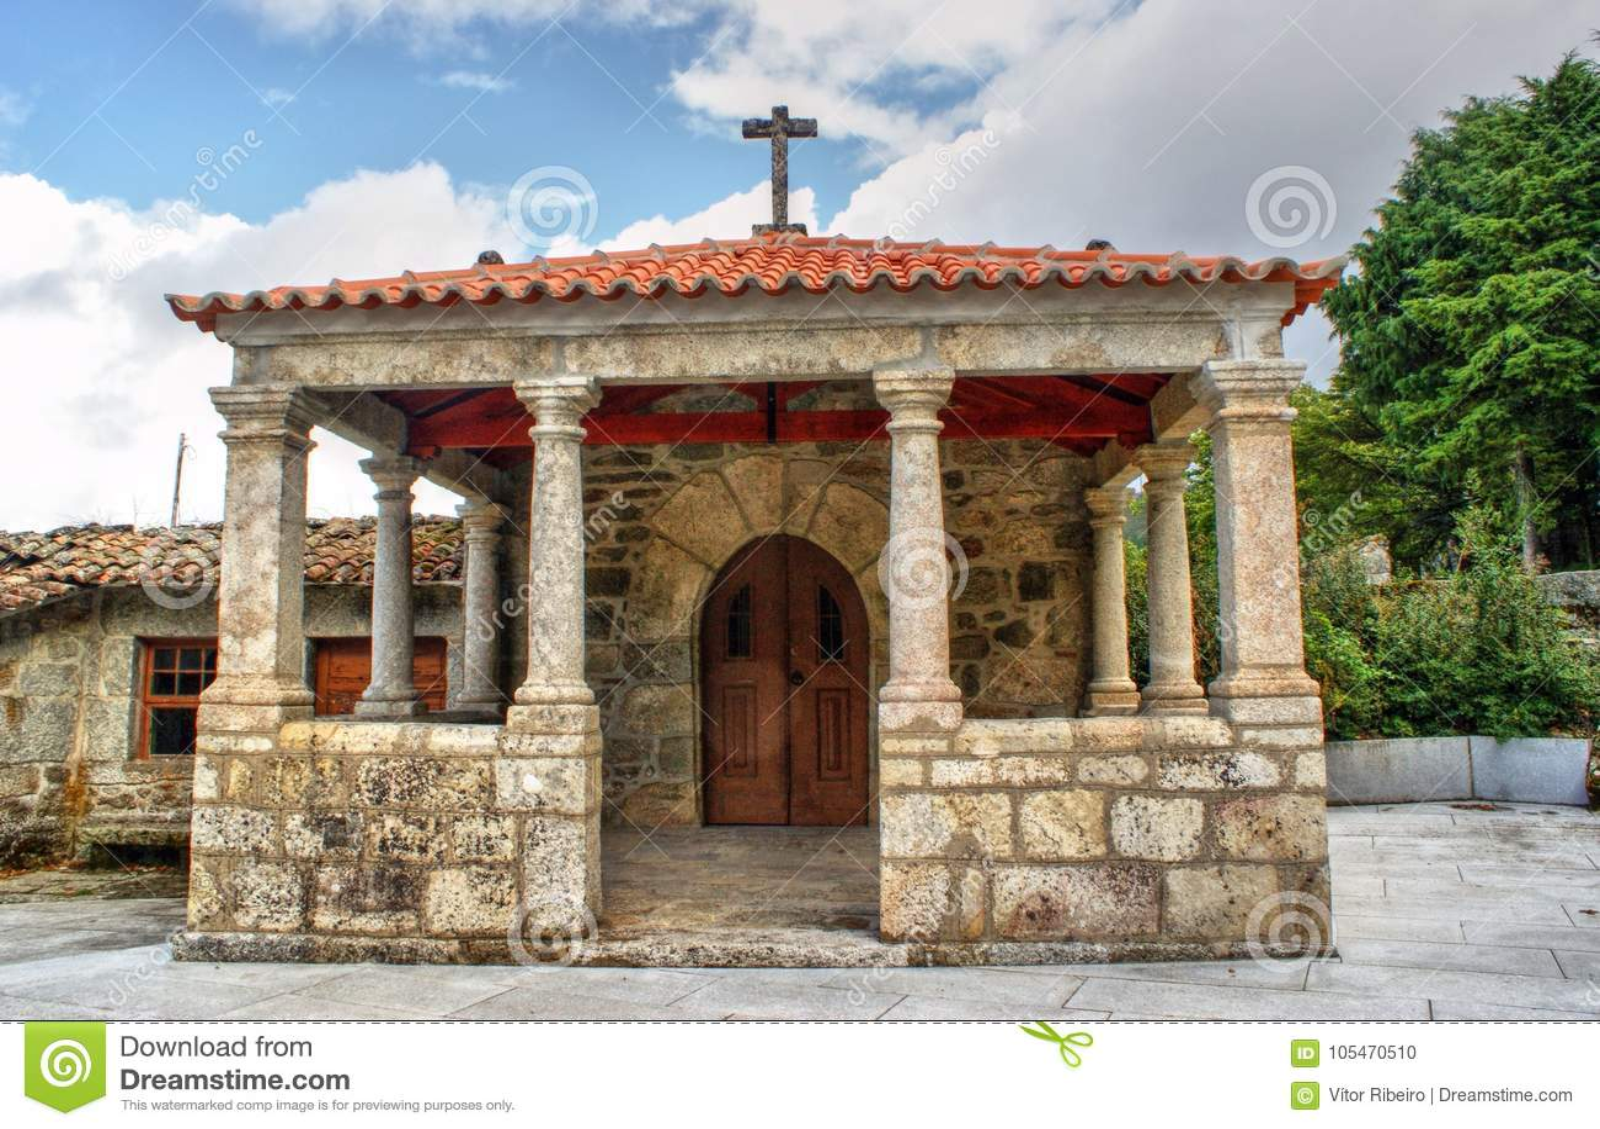 Download Old Little Church In Vila Pouca De Aguiar Stock Photo - Image of little, historic: 105470510